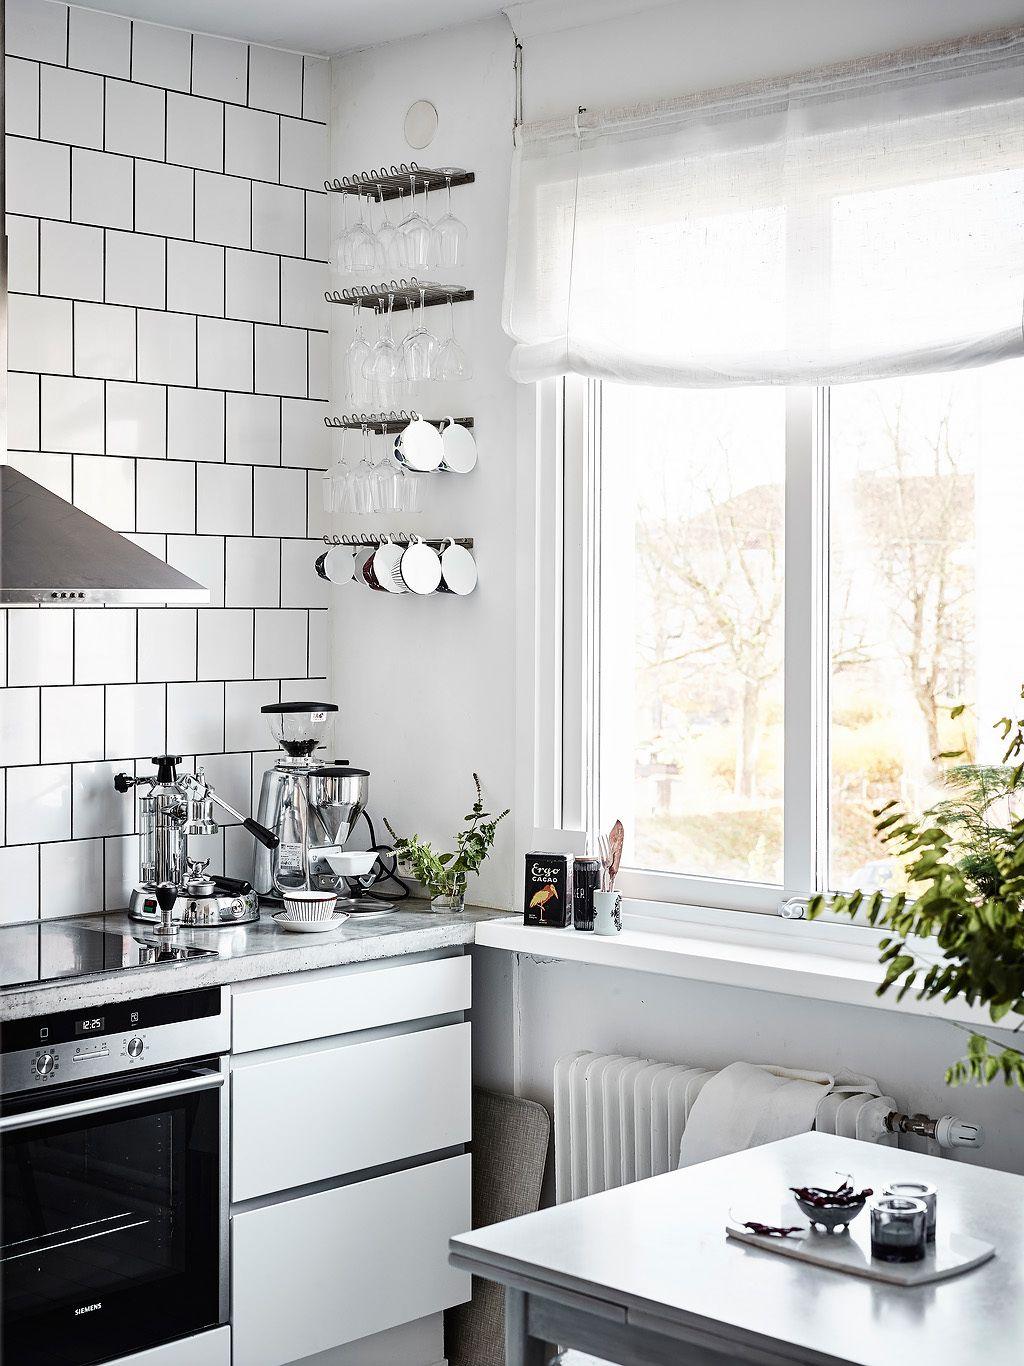 Stylish white kitchen   Stylish, Kitchens and Interiors